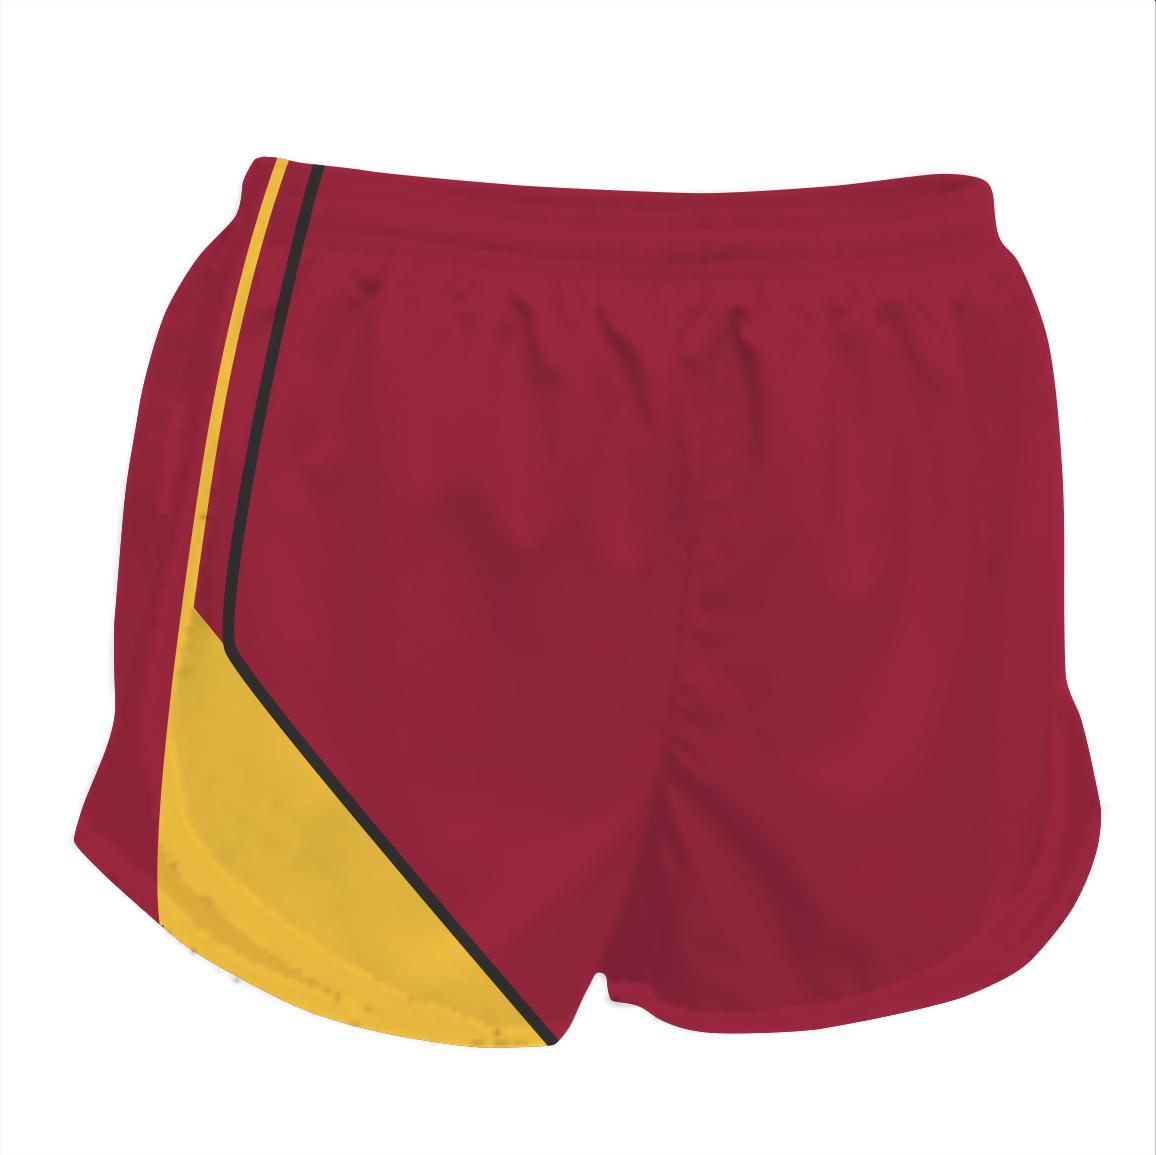 Panelled Zuco running shorts - Haile